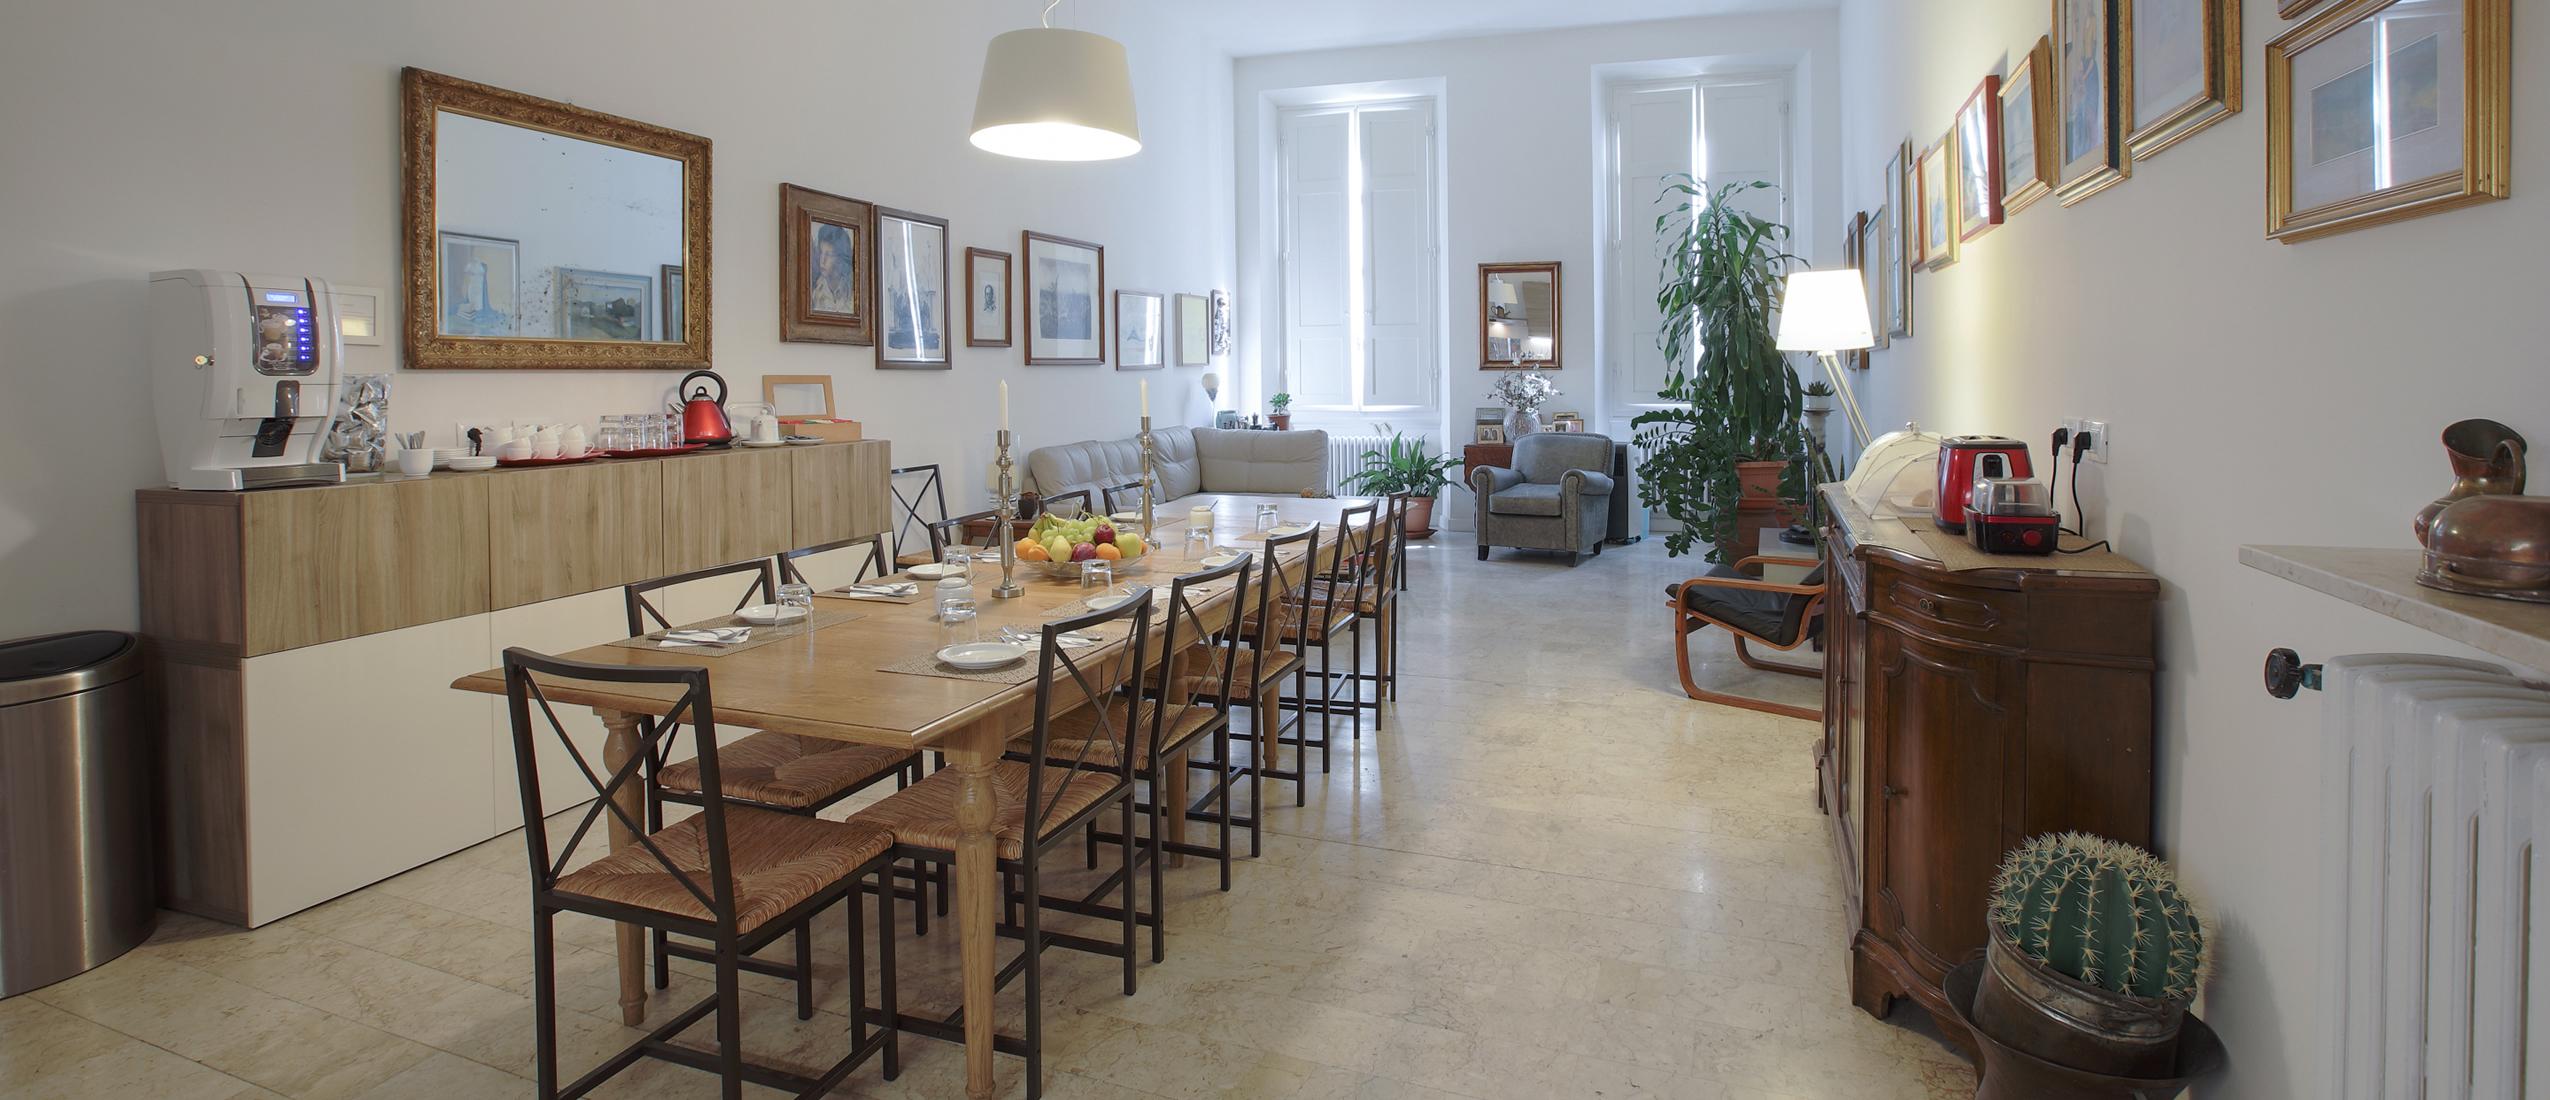 Badia Fiorentina Bed Breakfast A Firenze